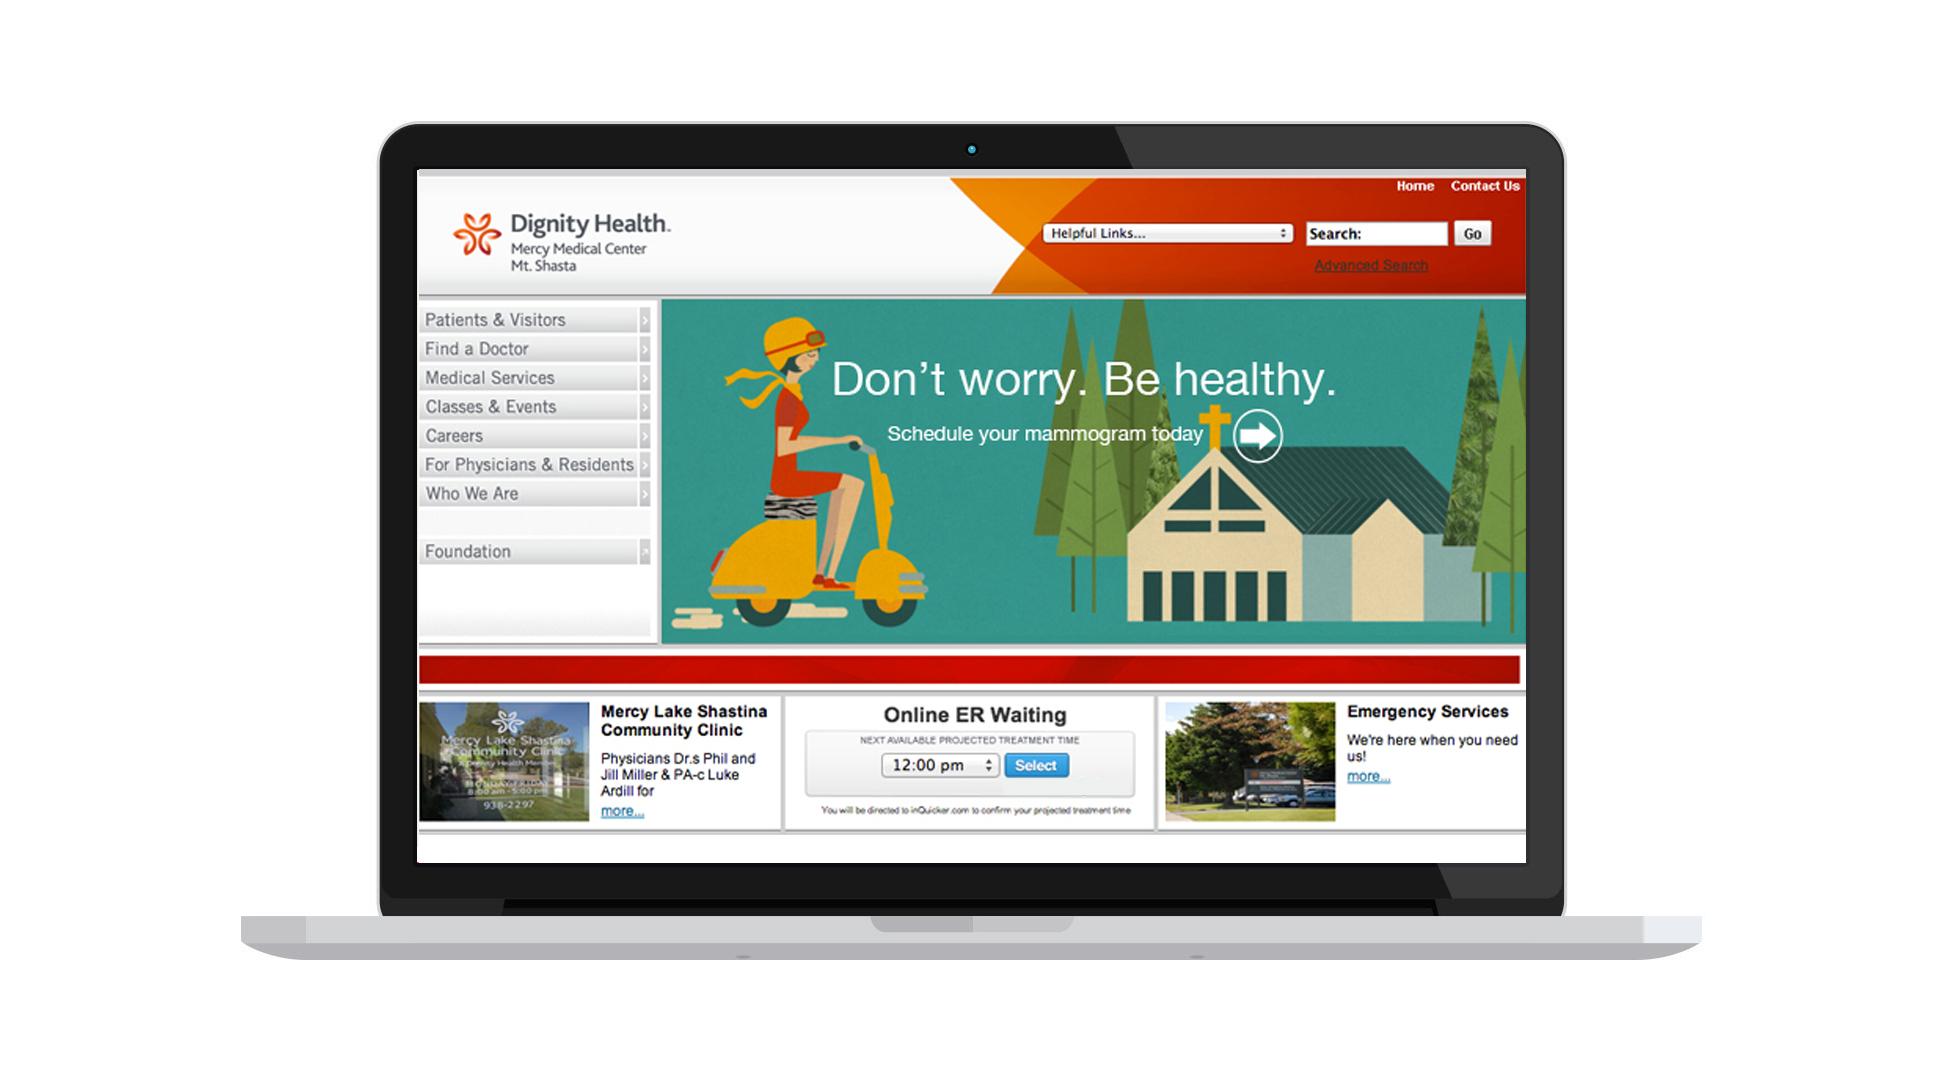 DIGNITY_HEALTH_WEB_BANNER.jpg